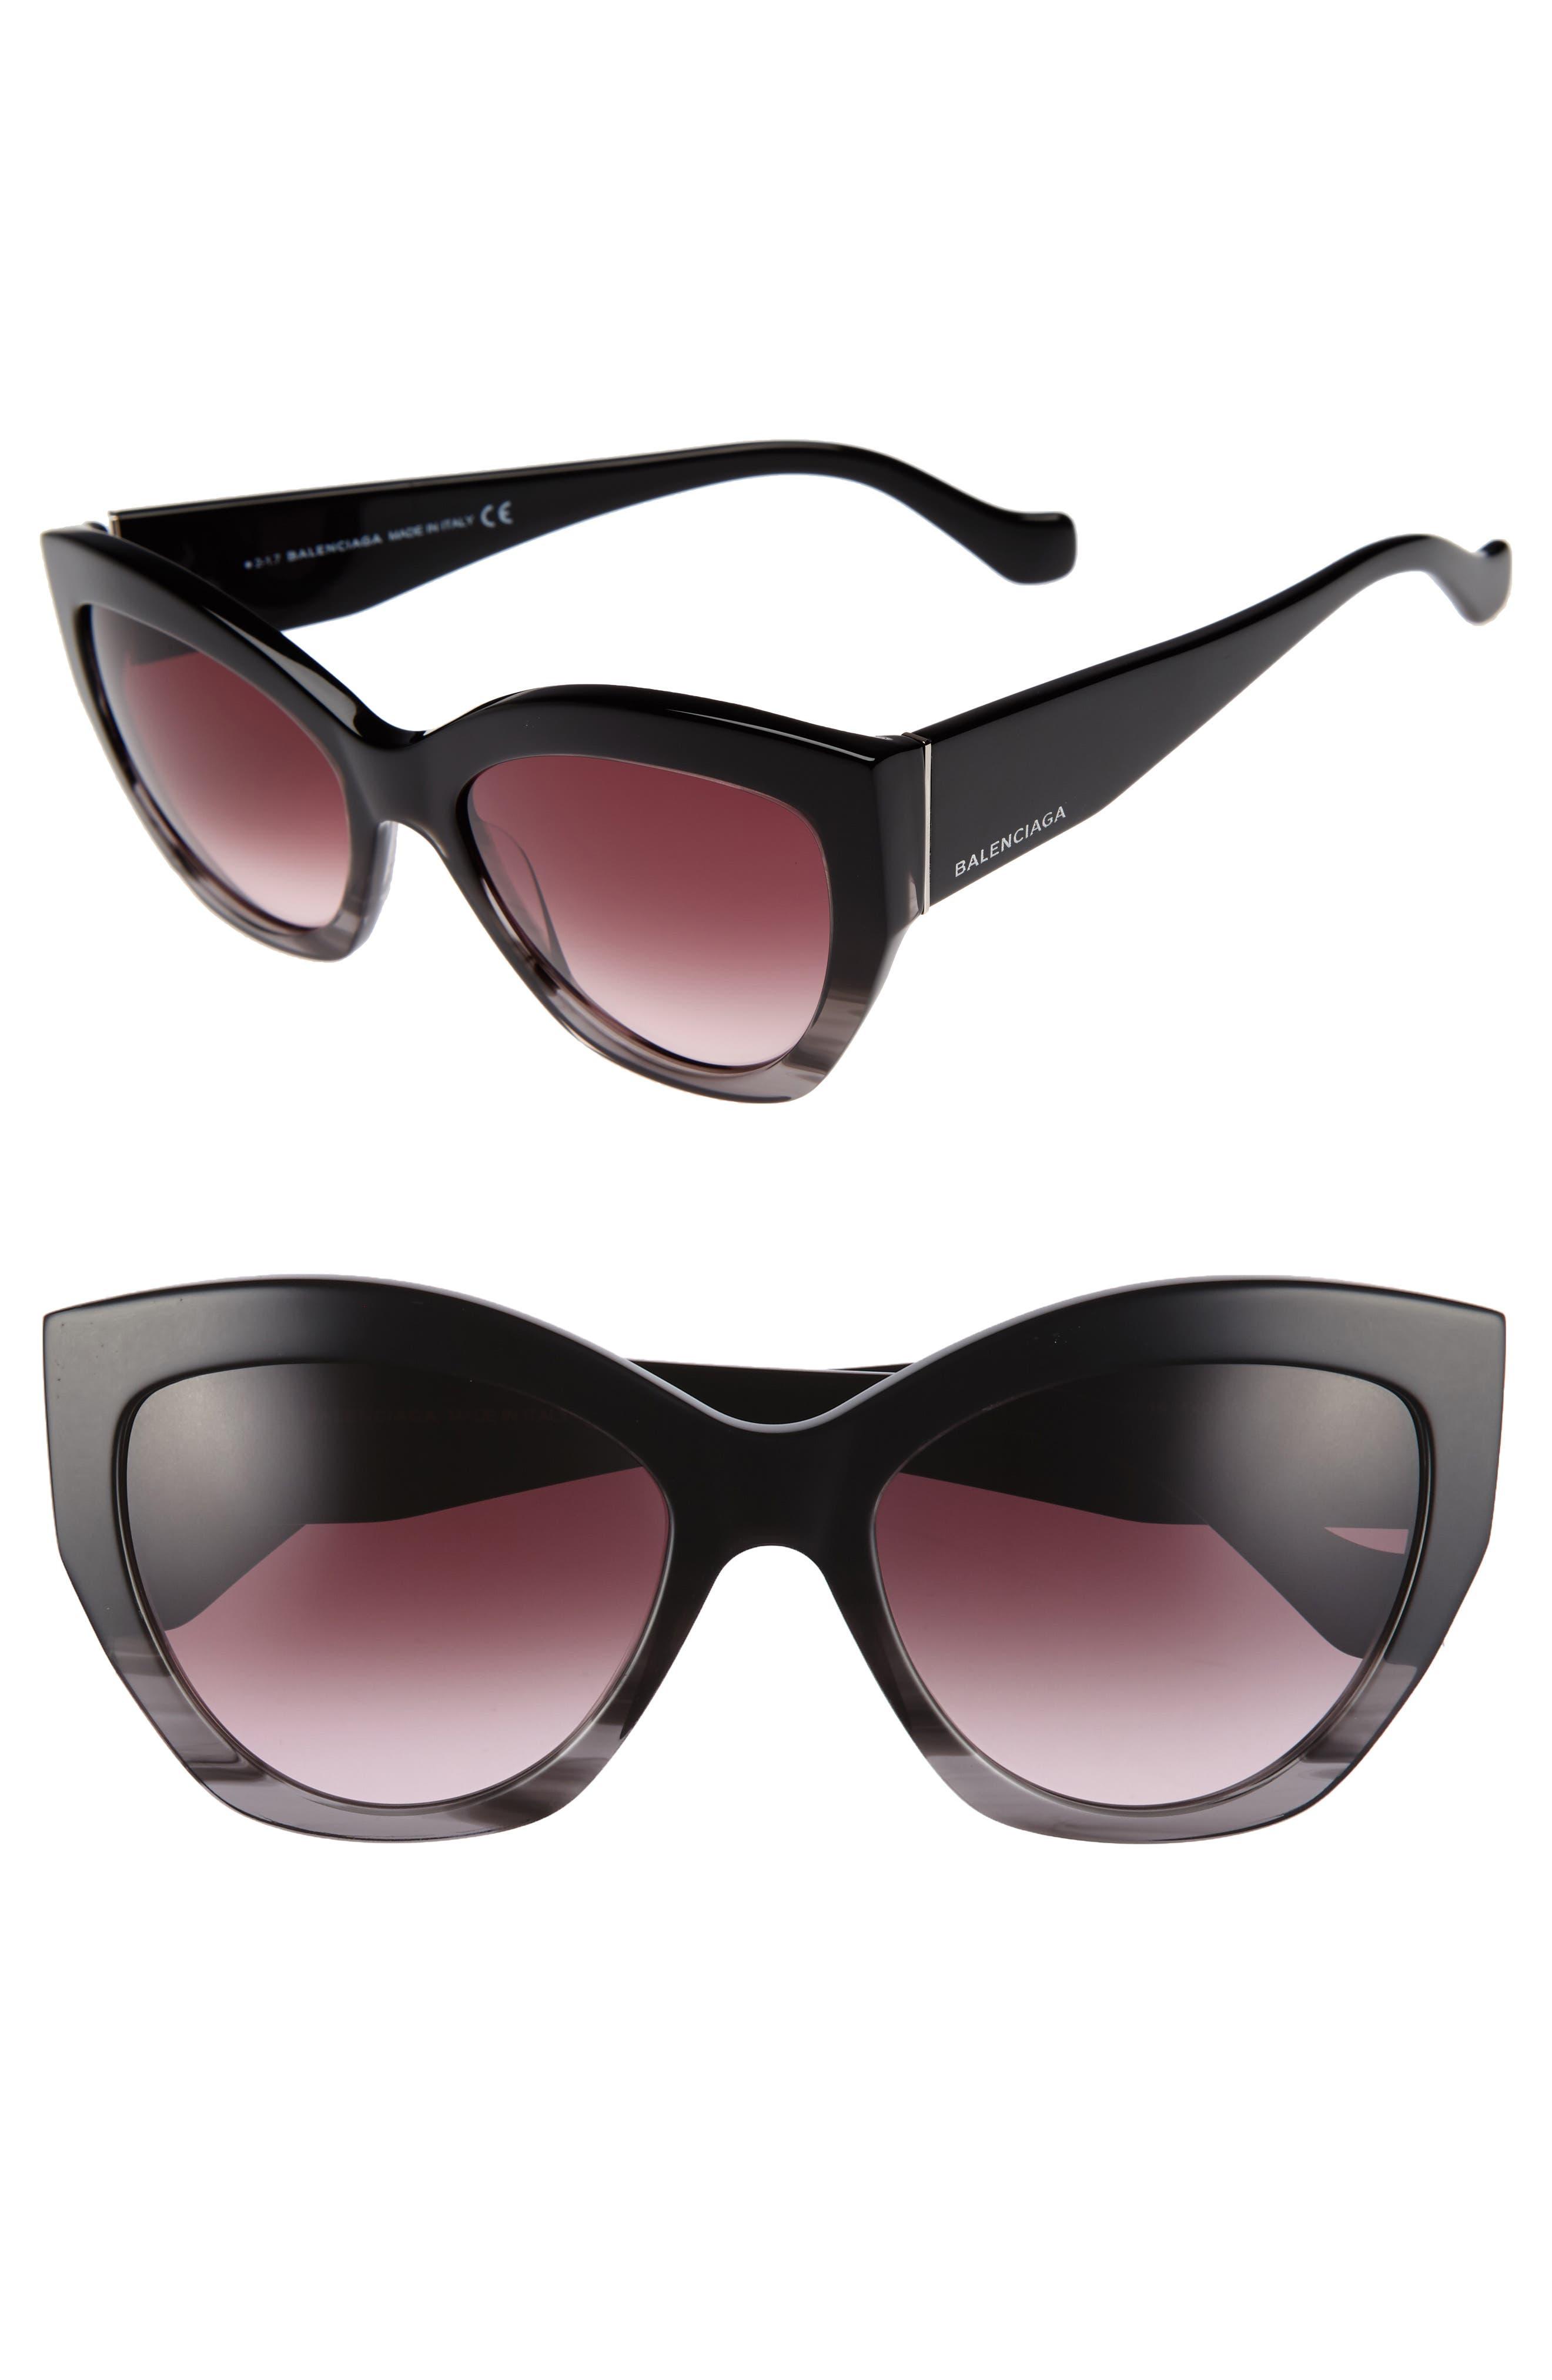 56mm Cat Eye Sunglasses,                         Main,                         color, Striped Black/ Opal/ Ruthenium